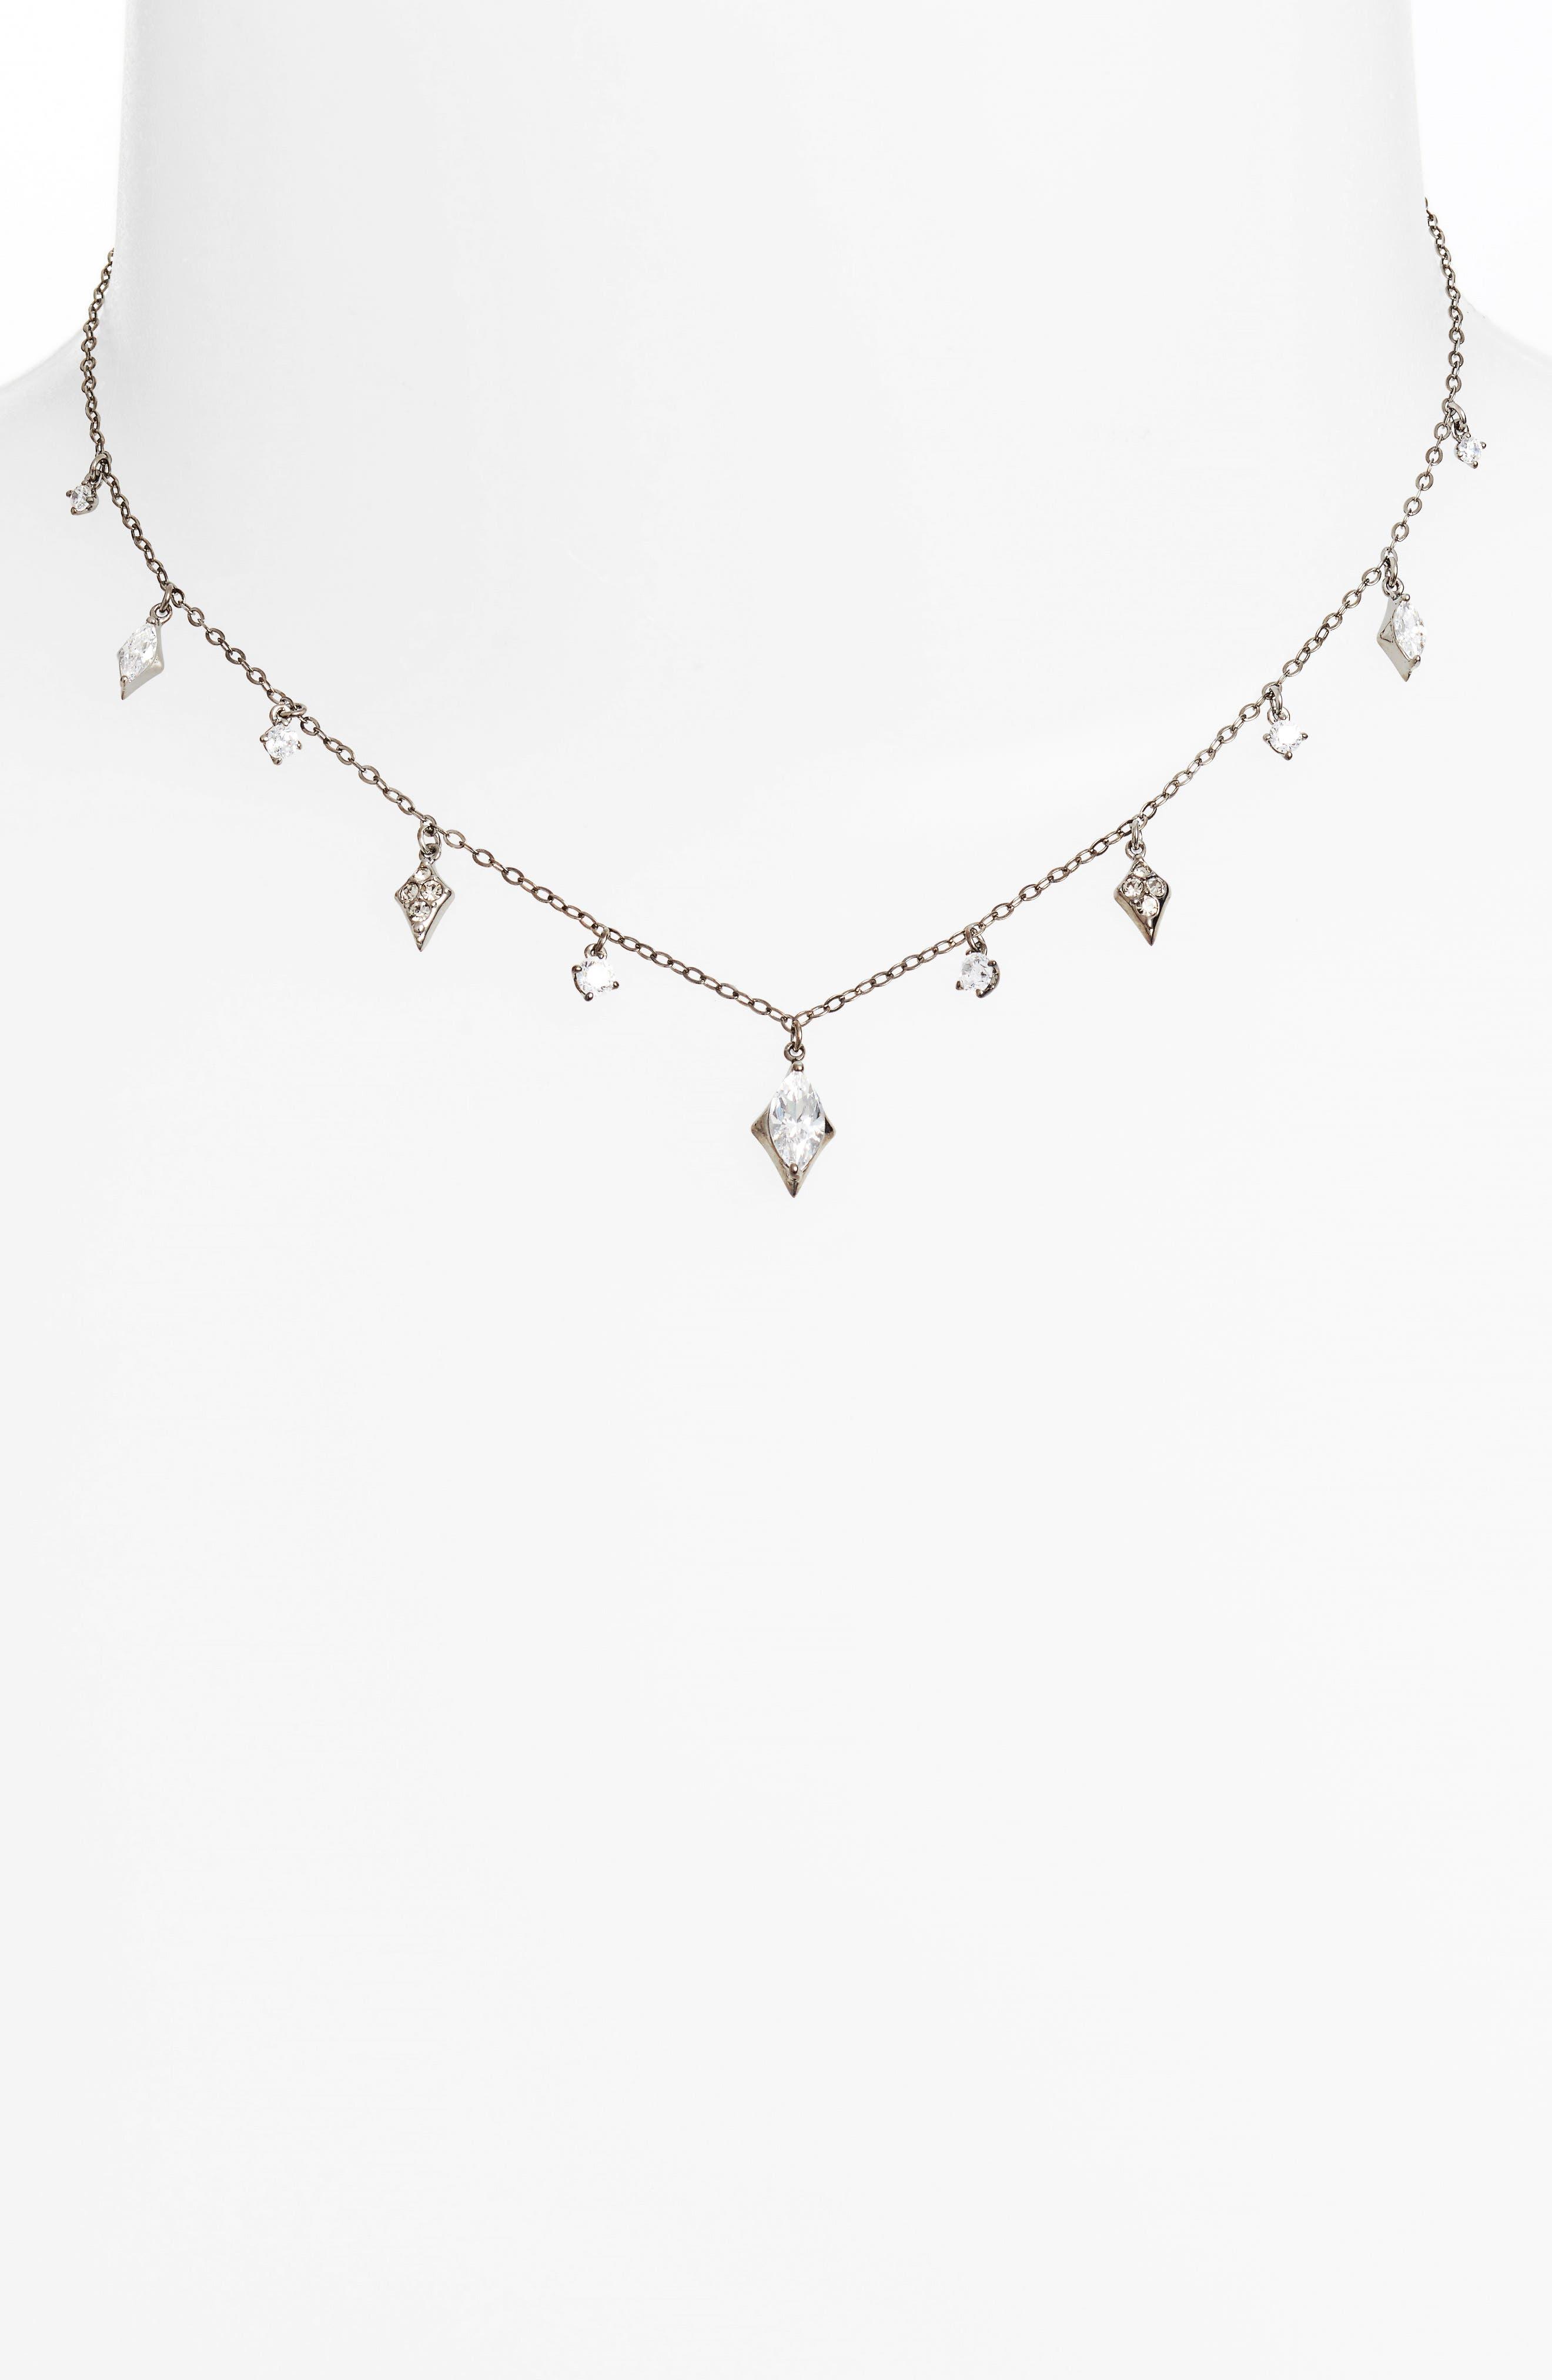 Nadri Noel Cubic Zirconia Dangling Choker Necklace